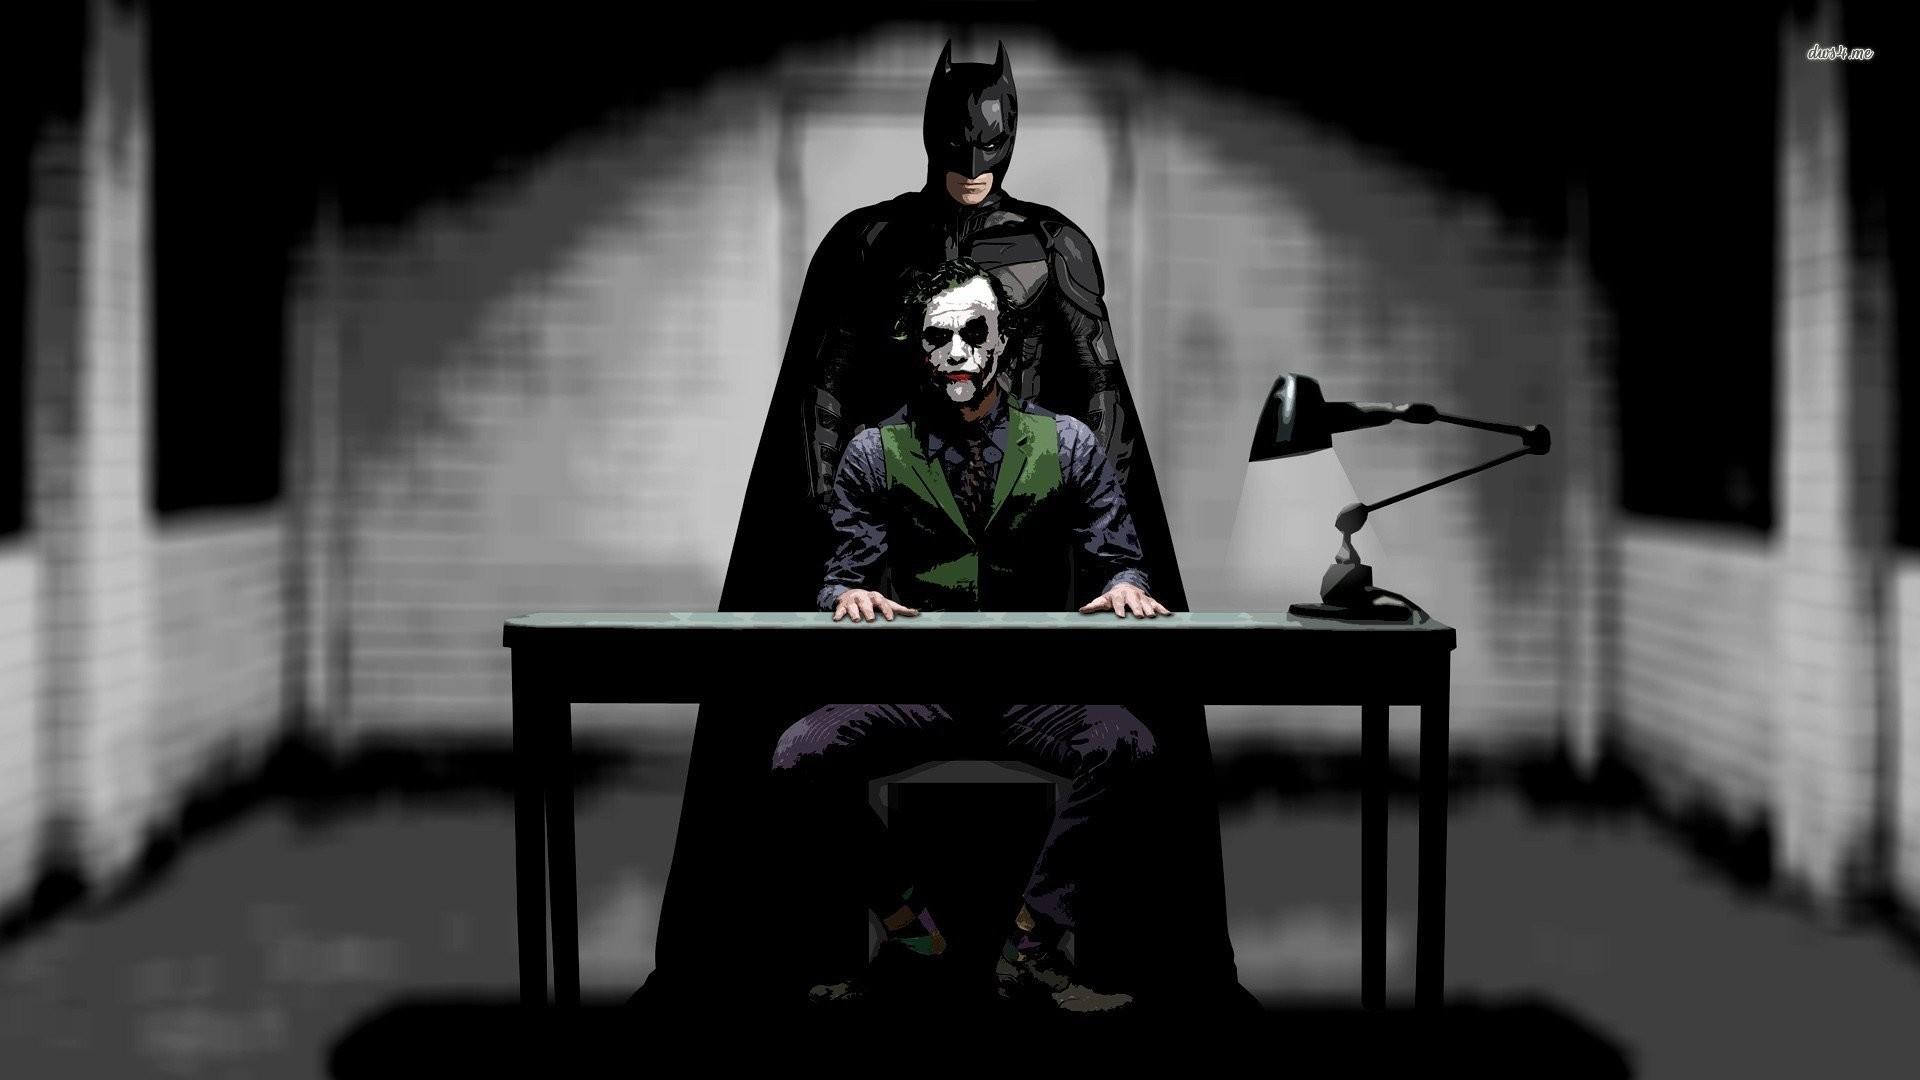 The Joker Dark Knight Wallpapers Wallpapers) – Adorable Wallpapers